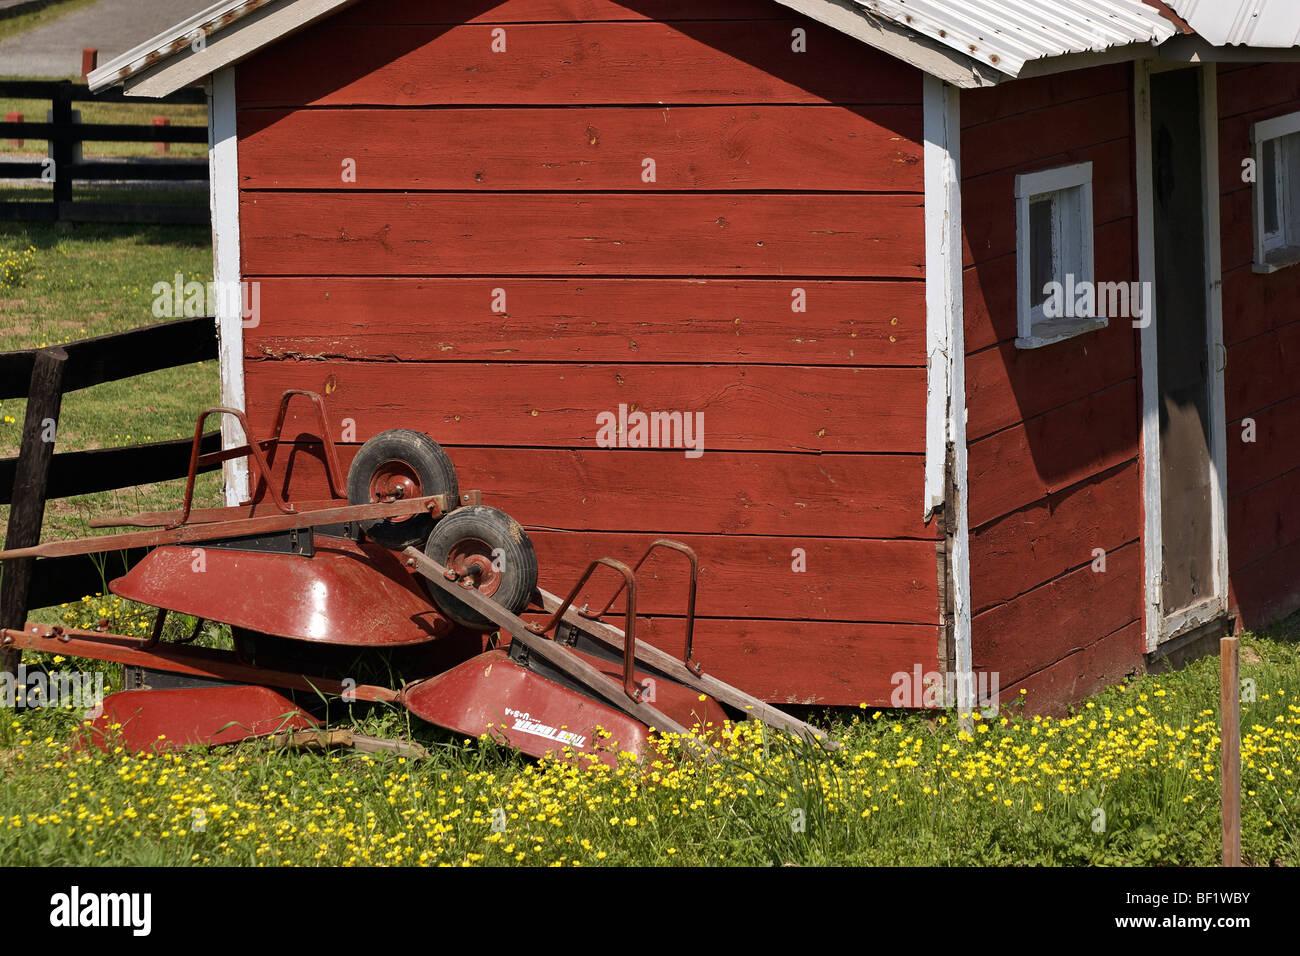 A Garden Shed In Frying Pan Farm Park, Herndon, Virginia